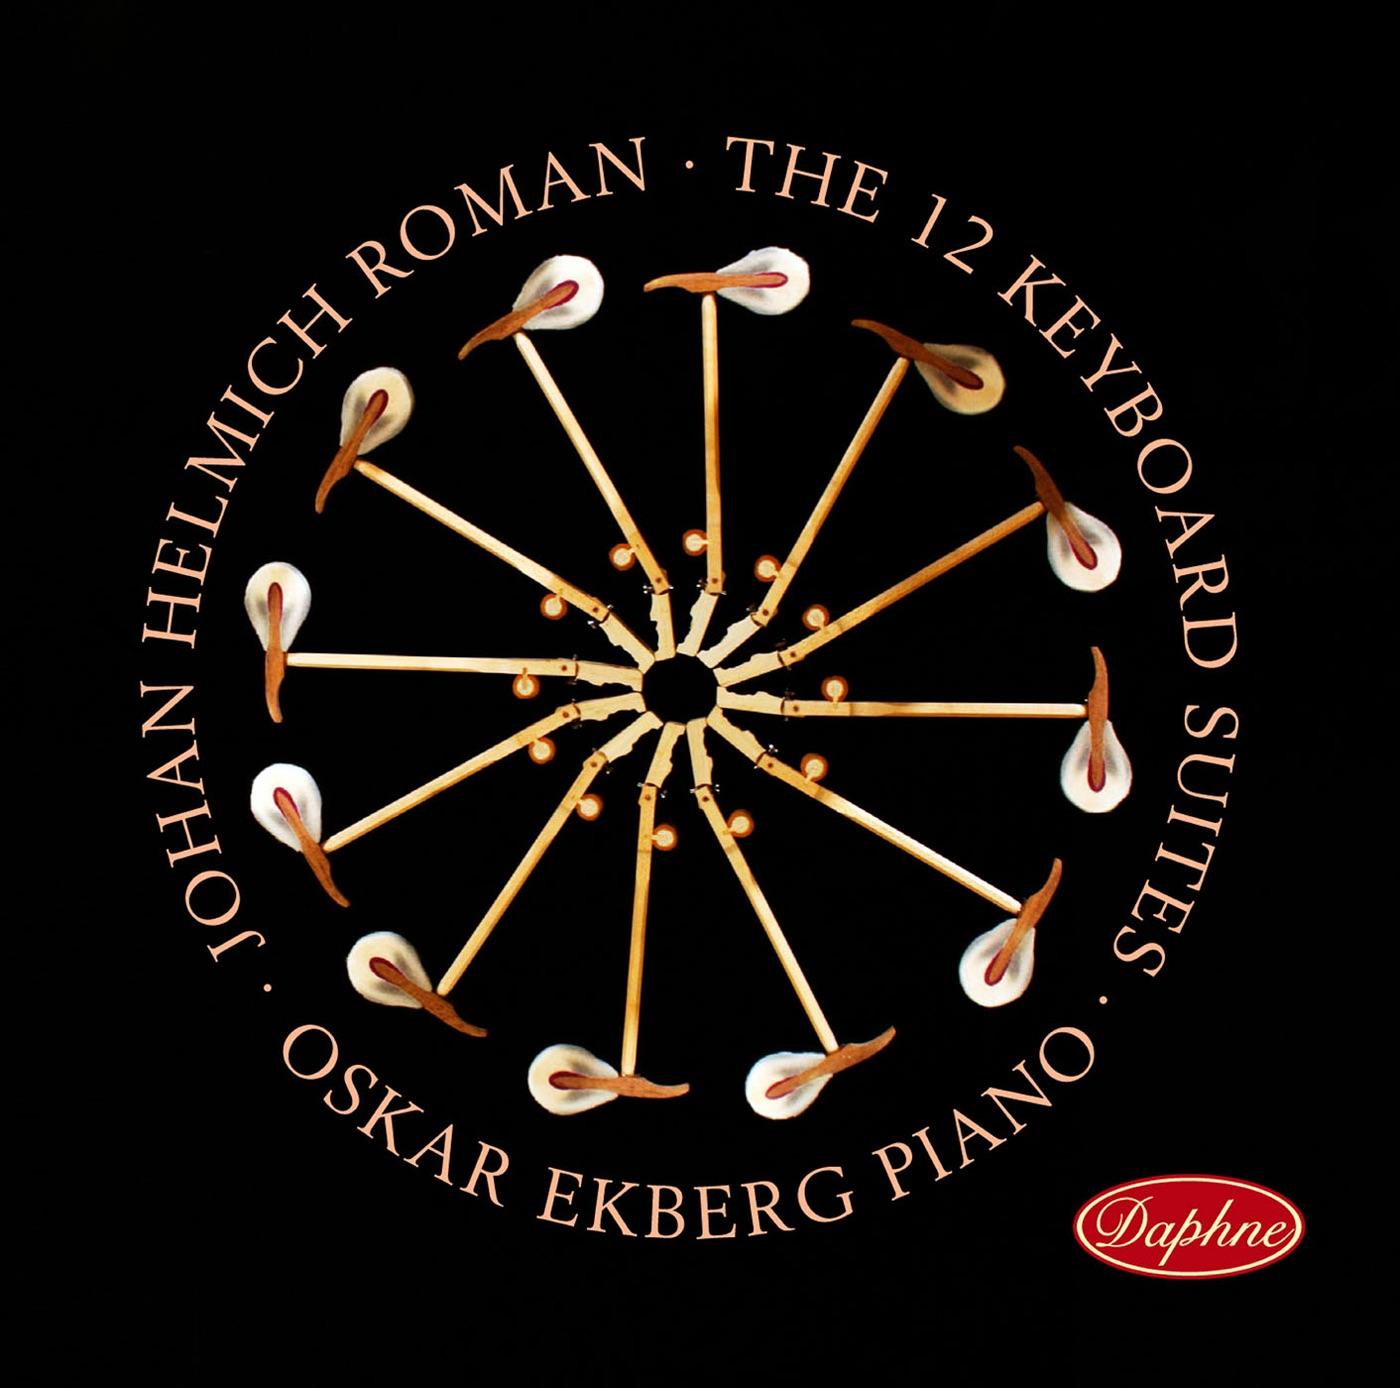 Harpsichord Sonata No. 9 in D Minor, BeRI 233: III. (Allegro)